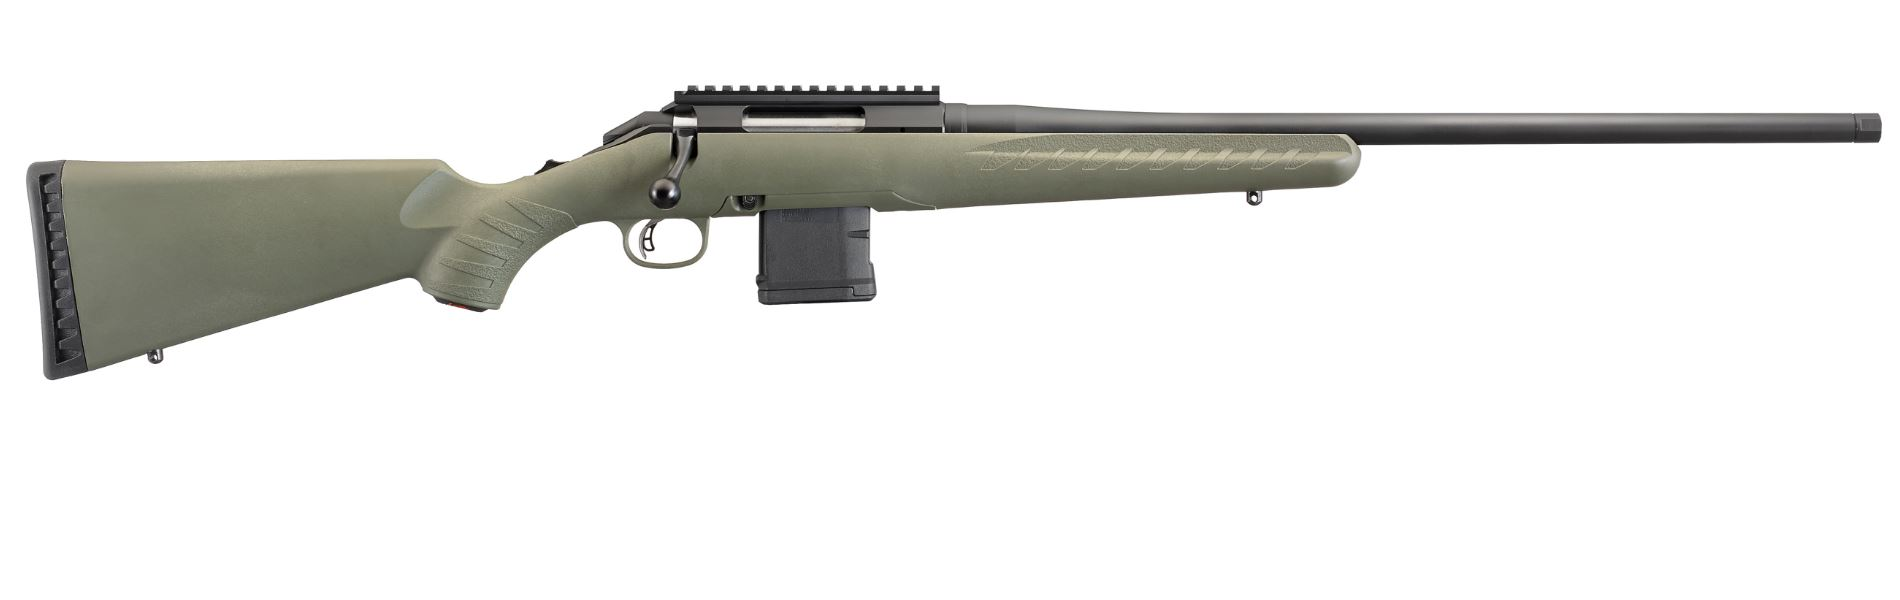 Ruger American Predator Rifle 204 Ruger